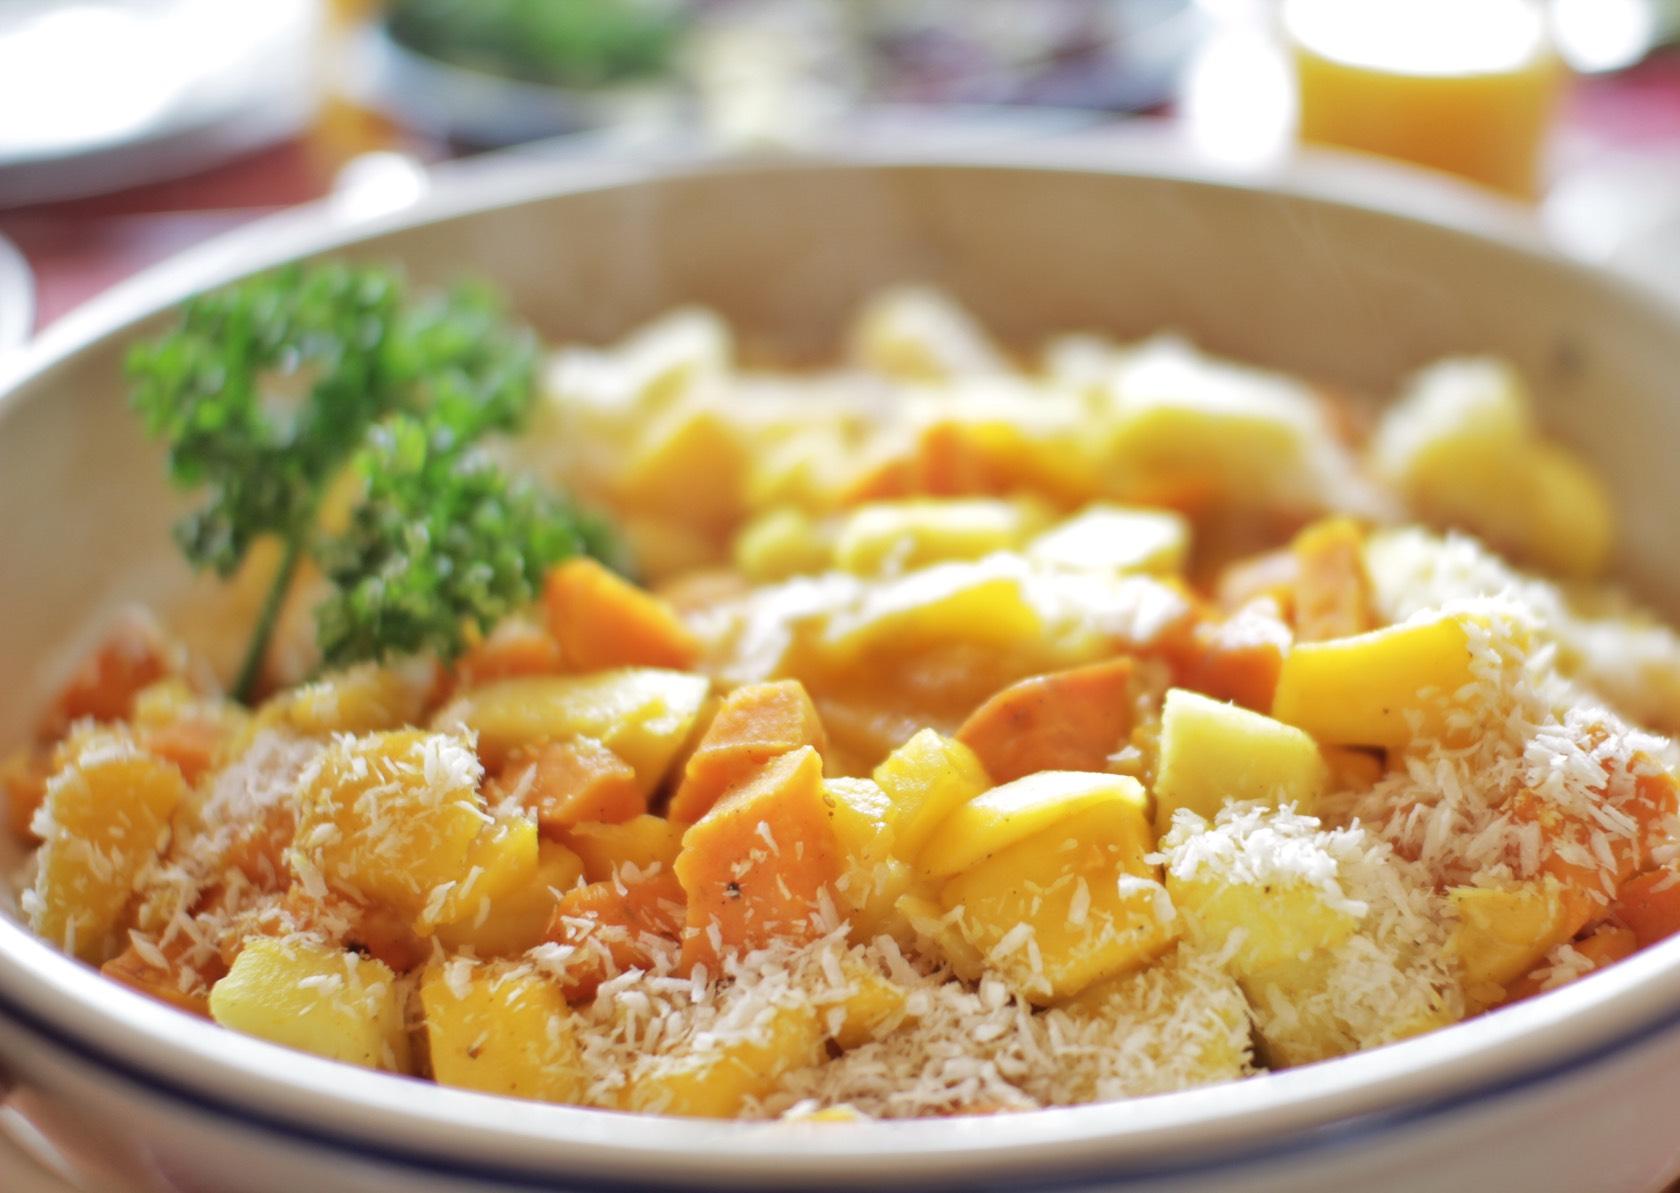 Suesskartoffel Ananas Mango Kokos Curry Paleo